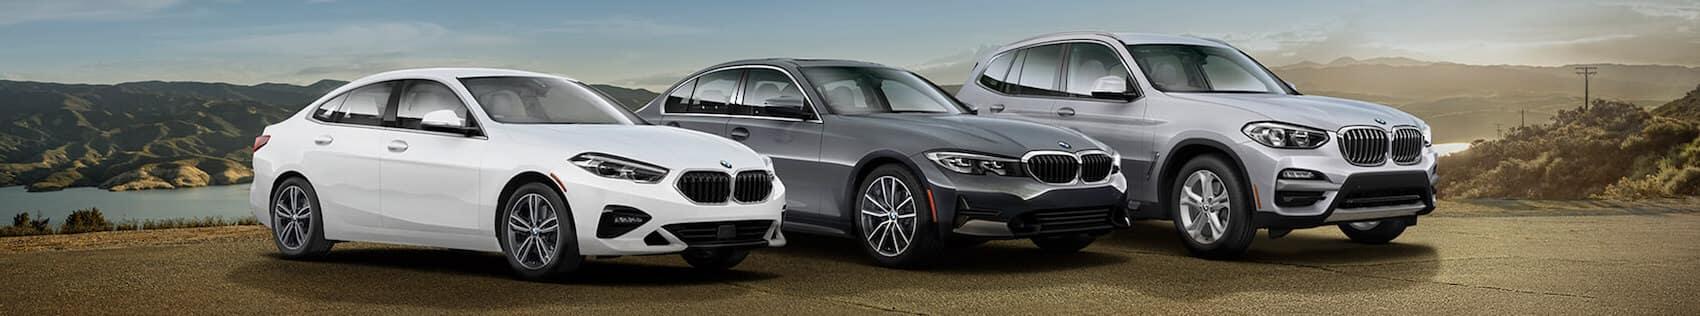 BMW vs Mercedes-Benz Hilton Head, SC